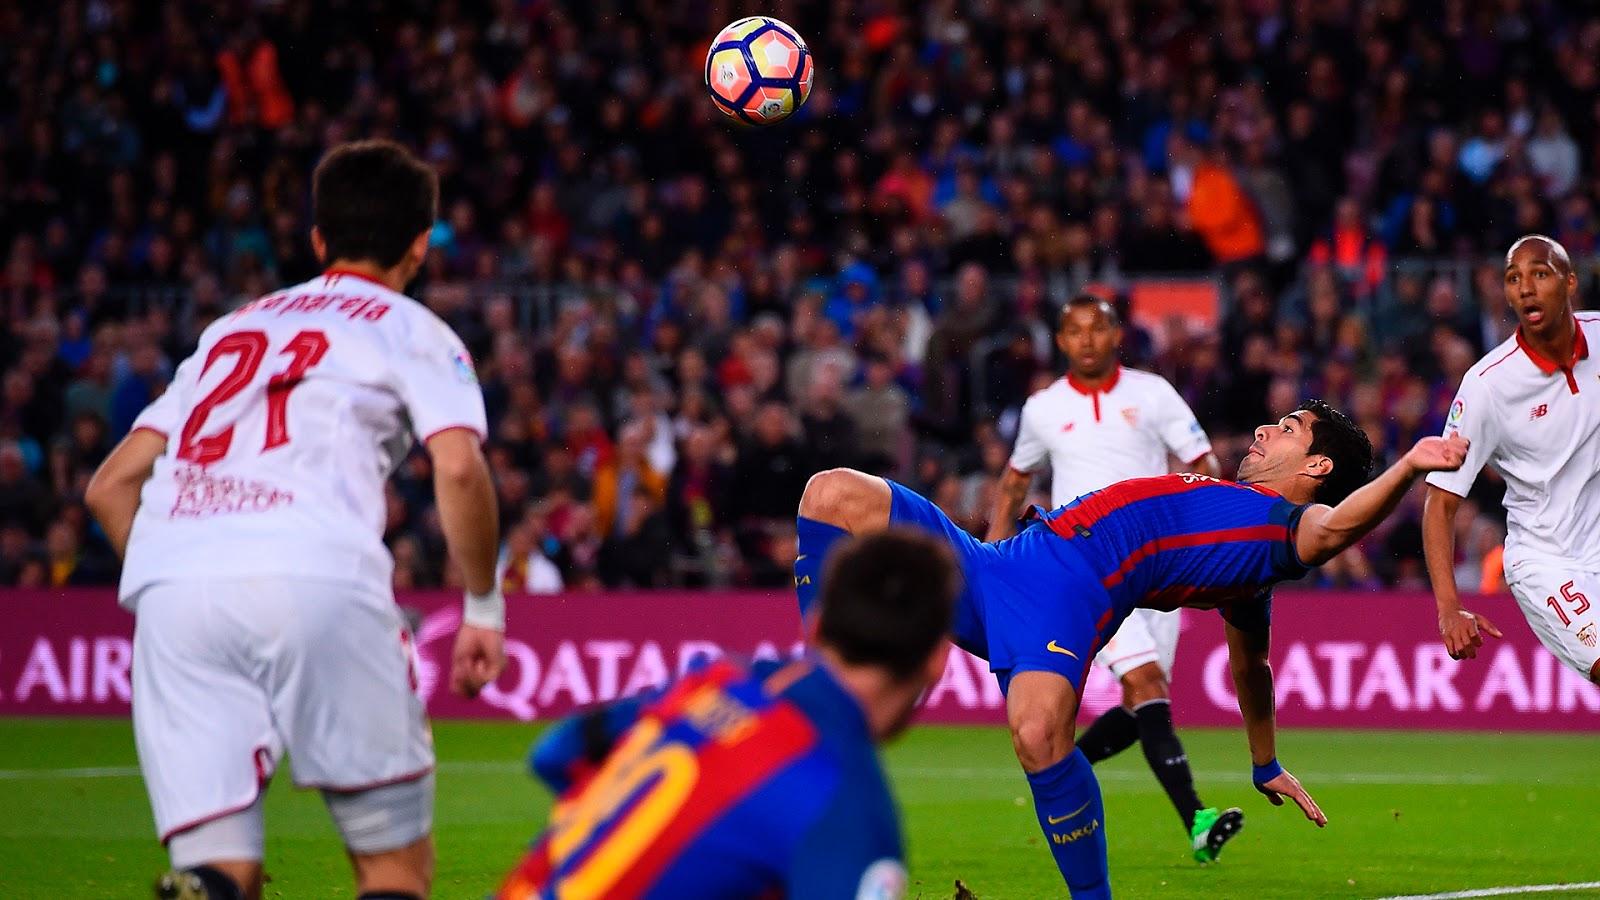 Lionel Messi and Luis Saurez Celebrating against Sevilla